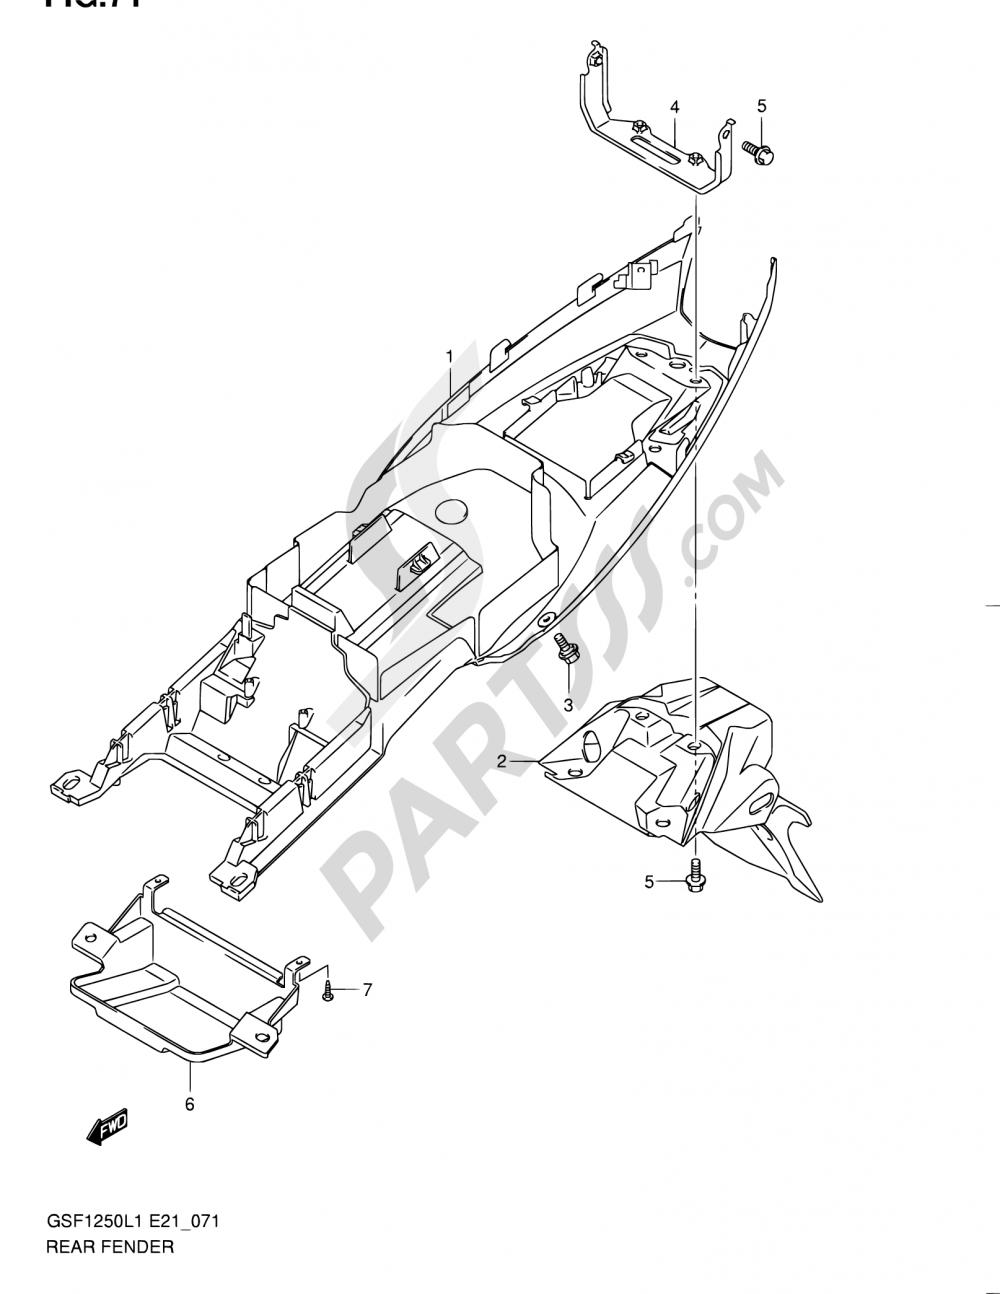 71 - REAR FENDER (GSF1250L1 E21) Suzuki BANDIT GSF1250A 2011